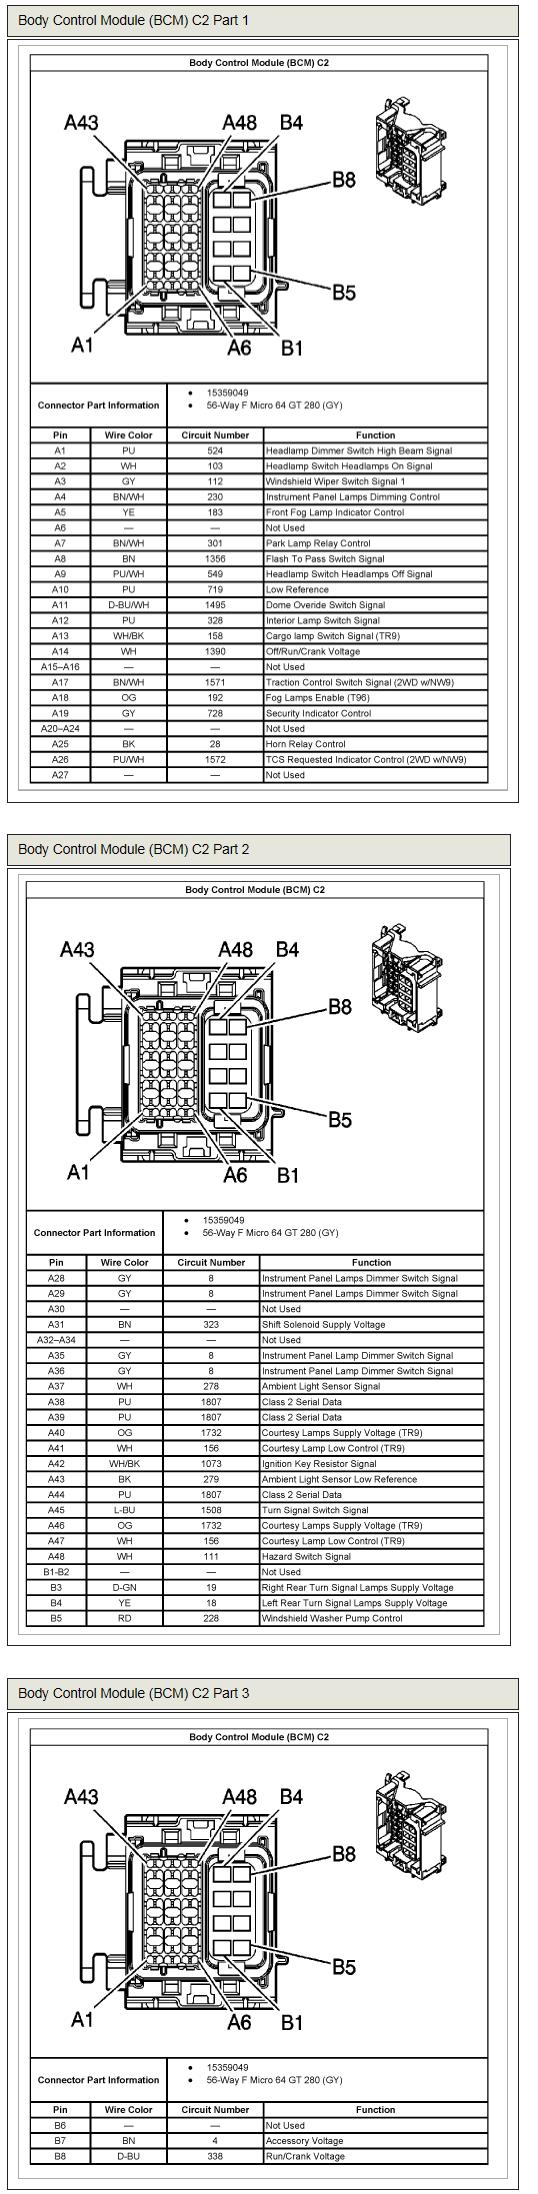 2005 Chevy Colorado Wiring Diagram Http Wwwjustanswercom Chevy